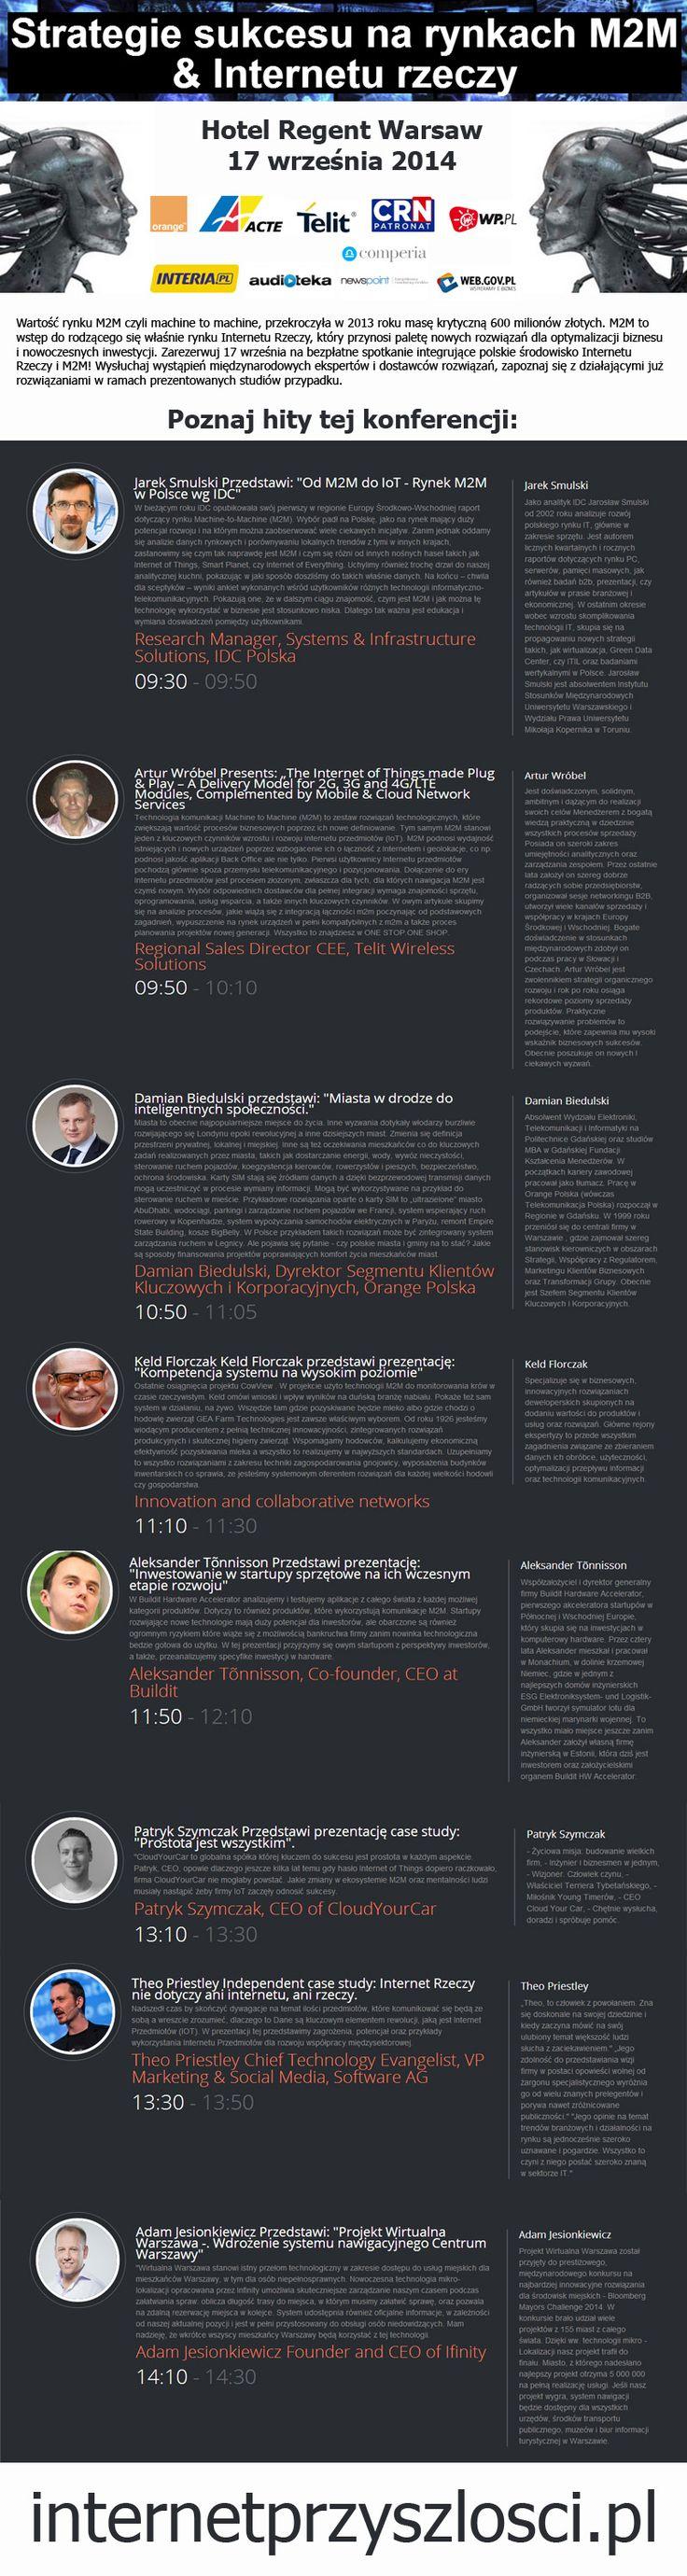 #internetprzyszlosci #InternetofThings #M2M #OrangePolska #Telit #ACTE, #TMobilePolska #CRN #Audioteka #WirtualnaPolska #Interia #NewsPoint #PARP #CRN #Comperia #KonferencjaM2M